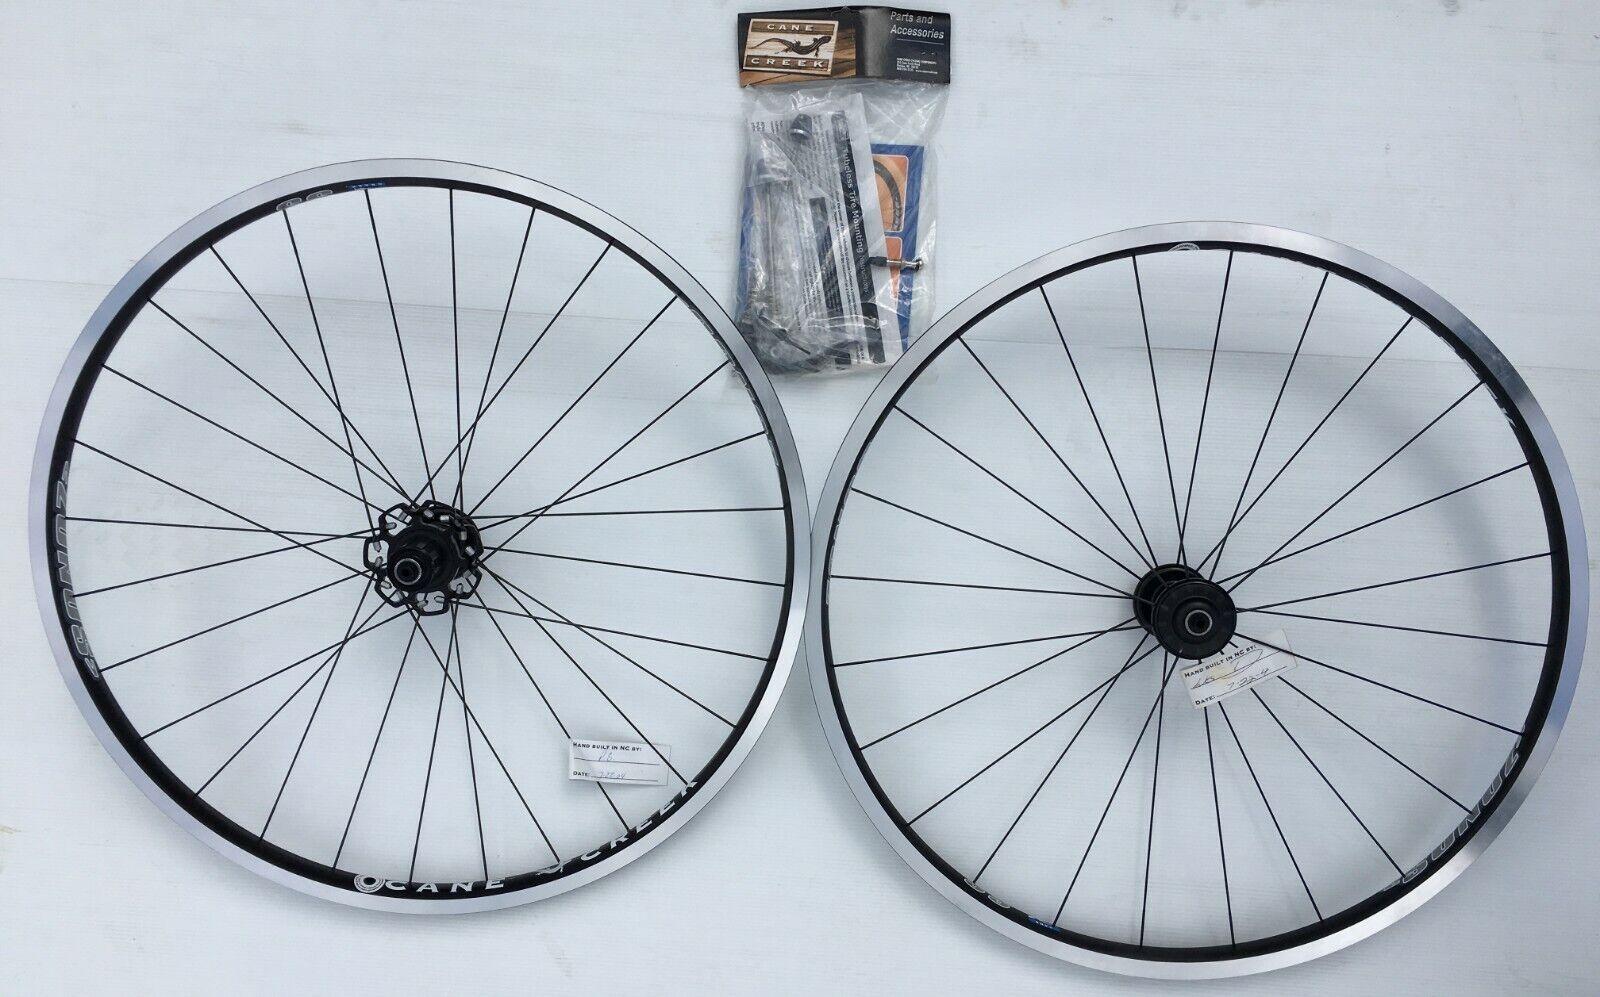 Set ruote MTB Cane Creek Zonos SS 26 Tubeless bicicletta mountain bike wheel set